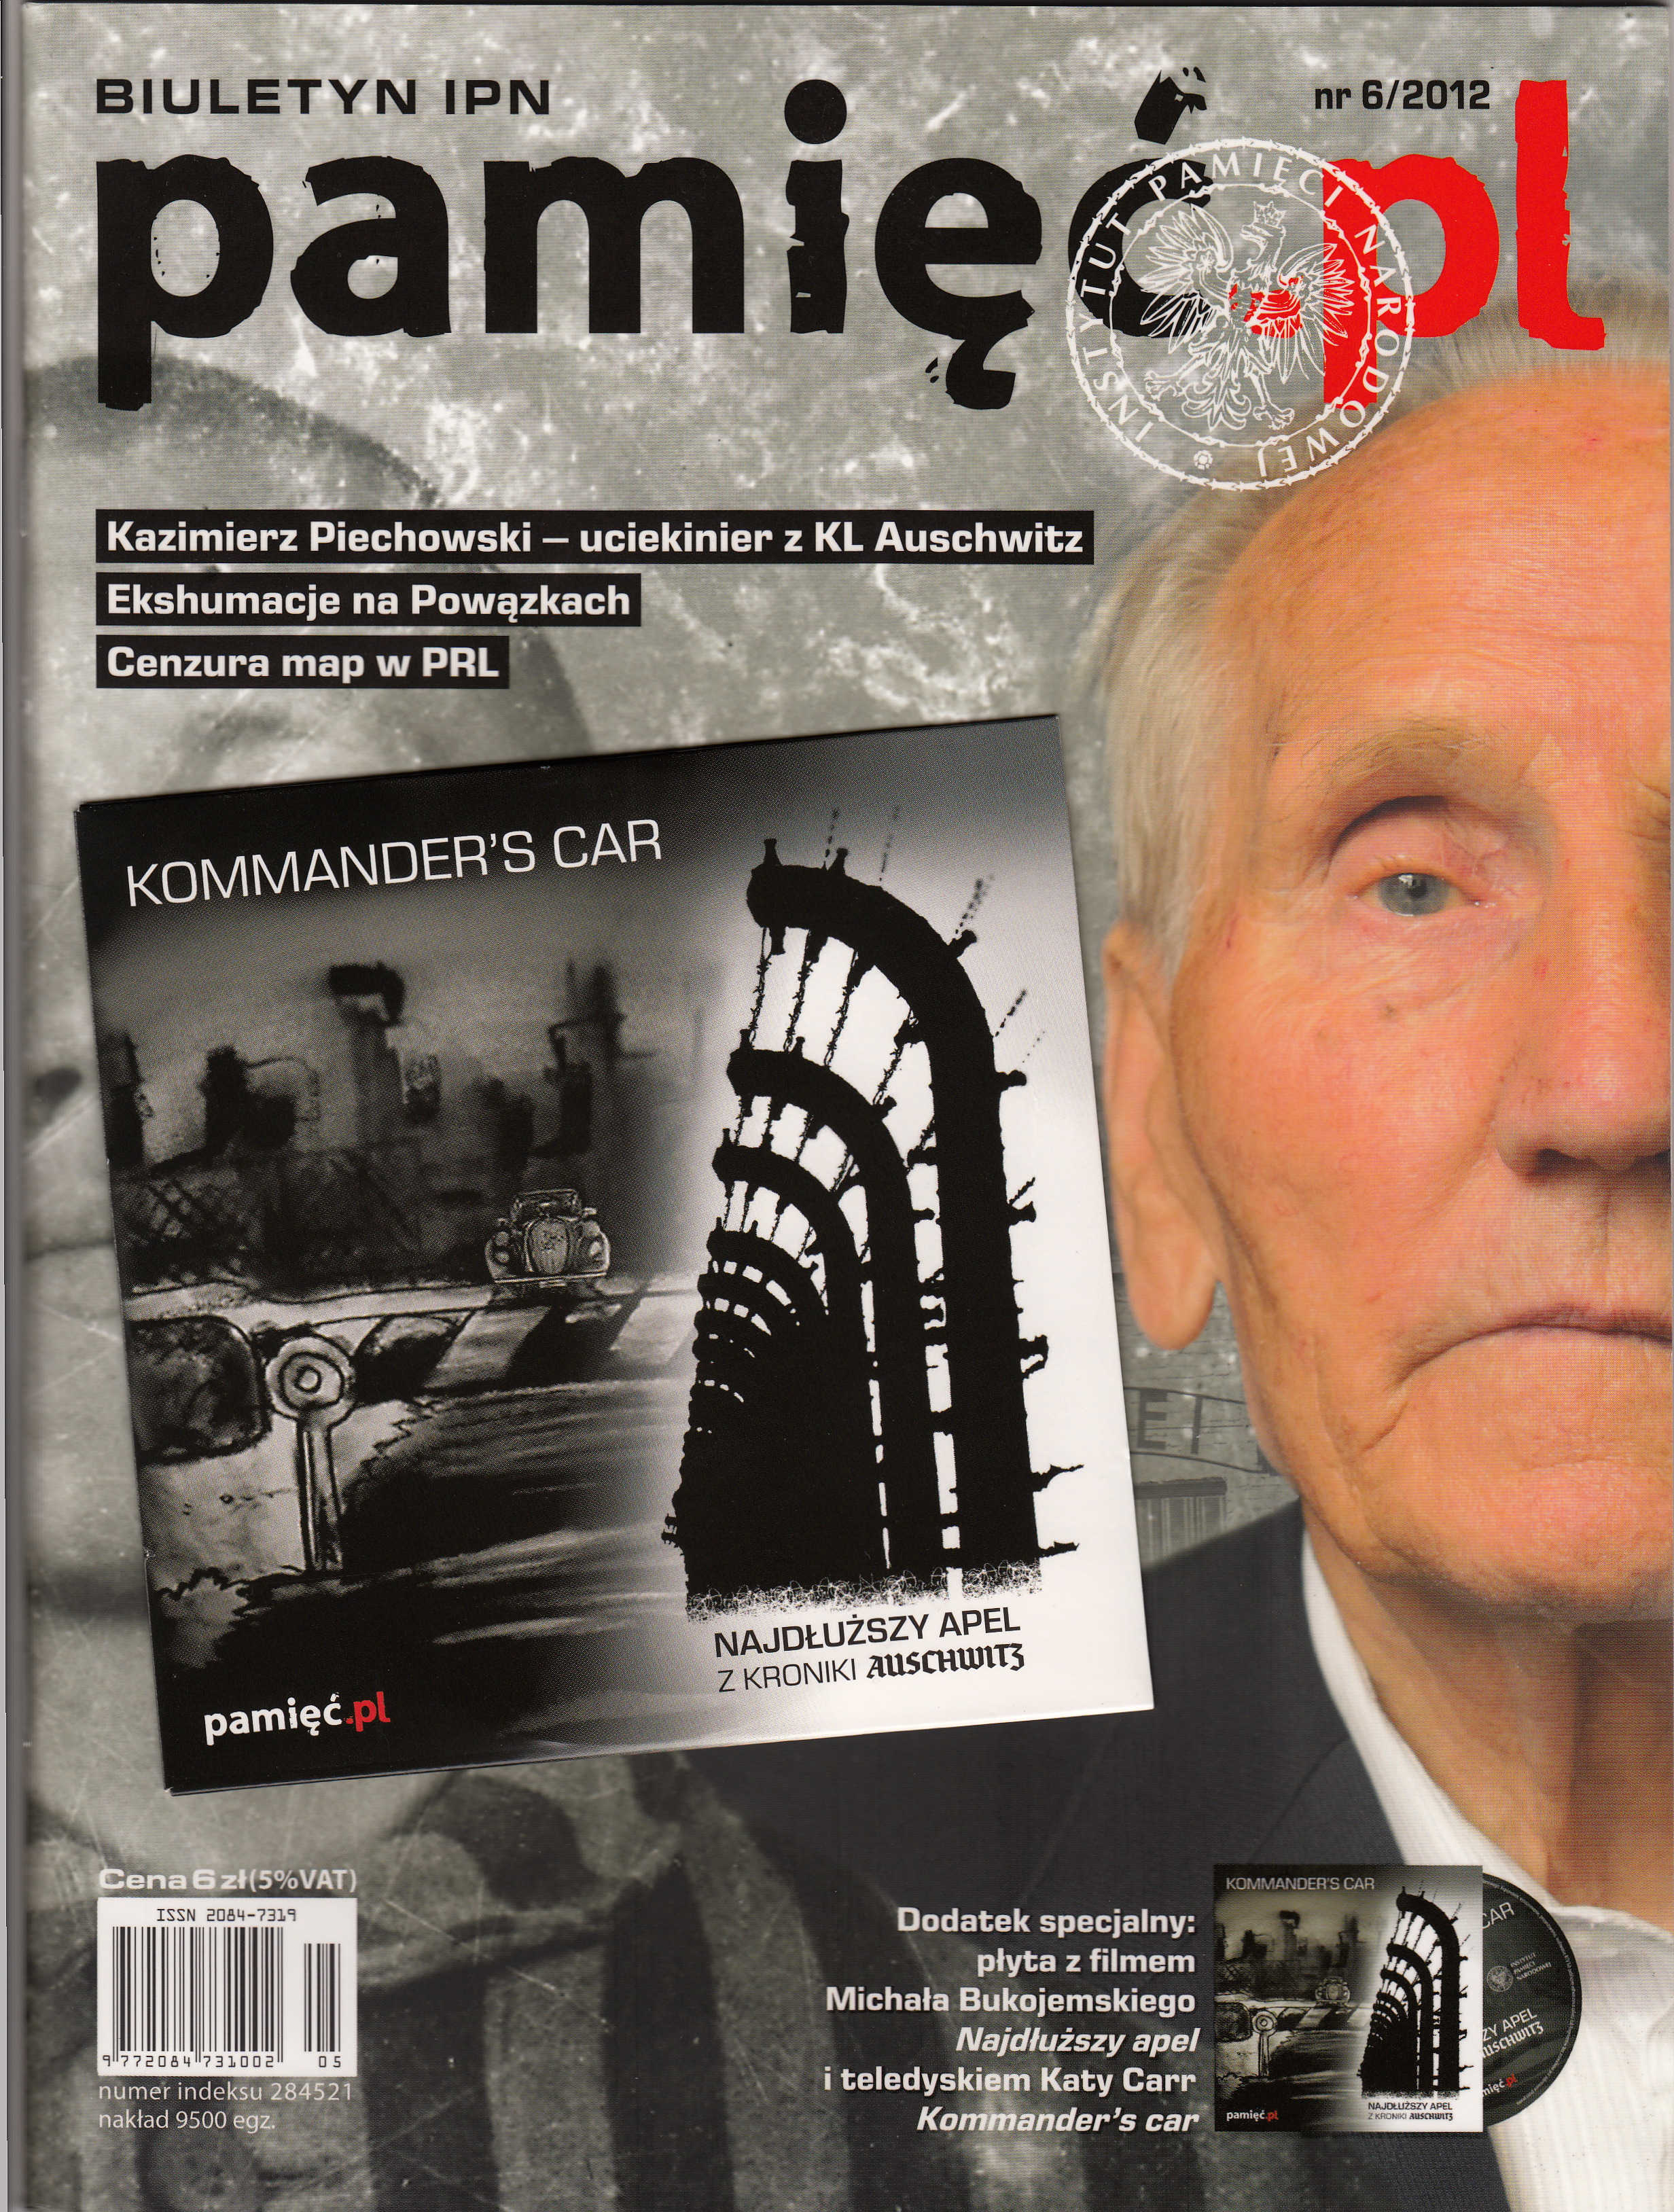 Pamiec.pl Kazik Kommander's Car July 2012 Katy article